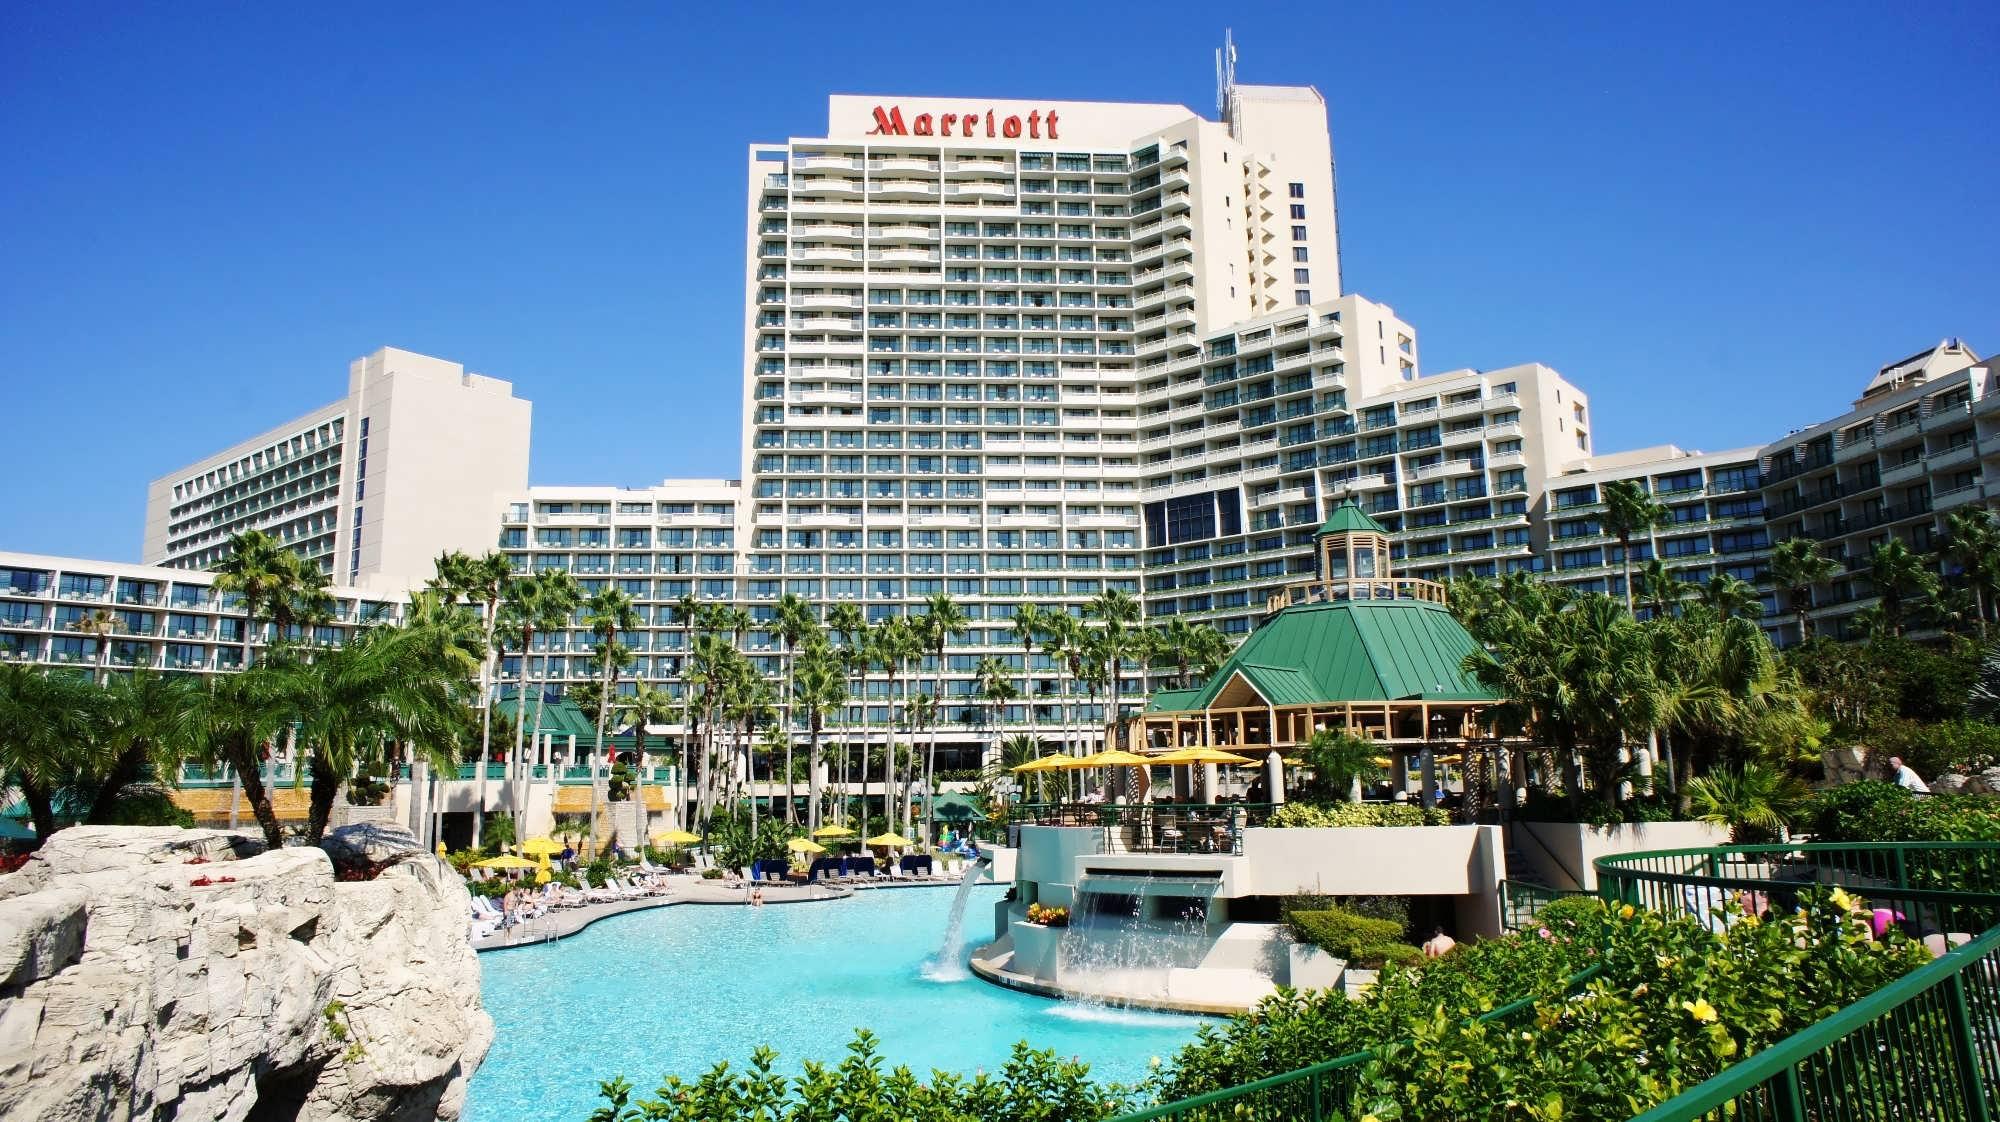 marriott world center orlando pool area 555 oi